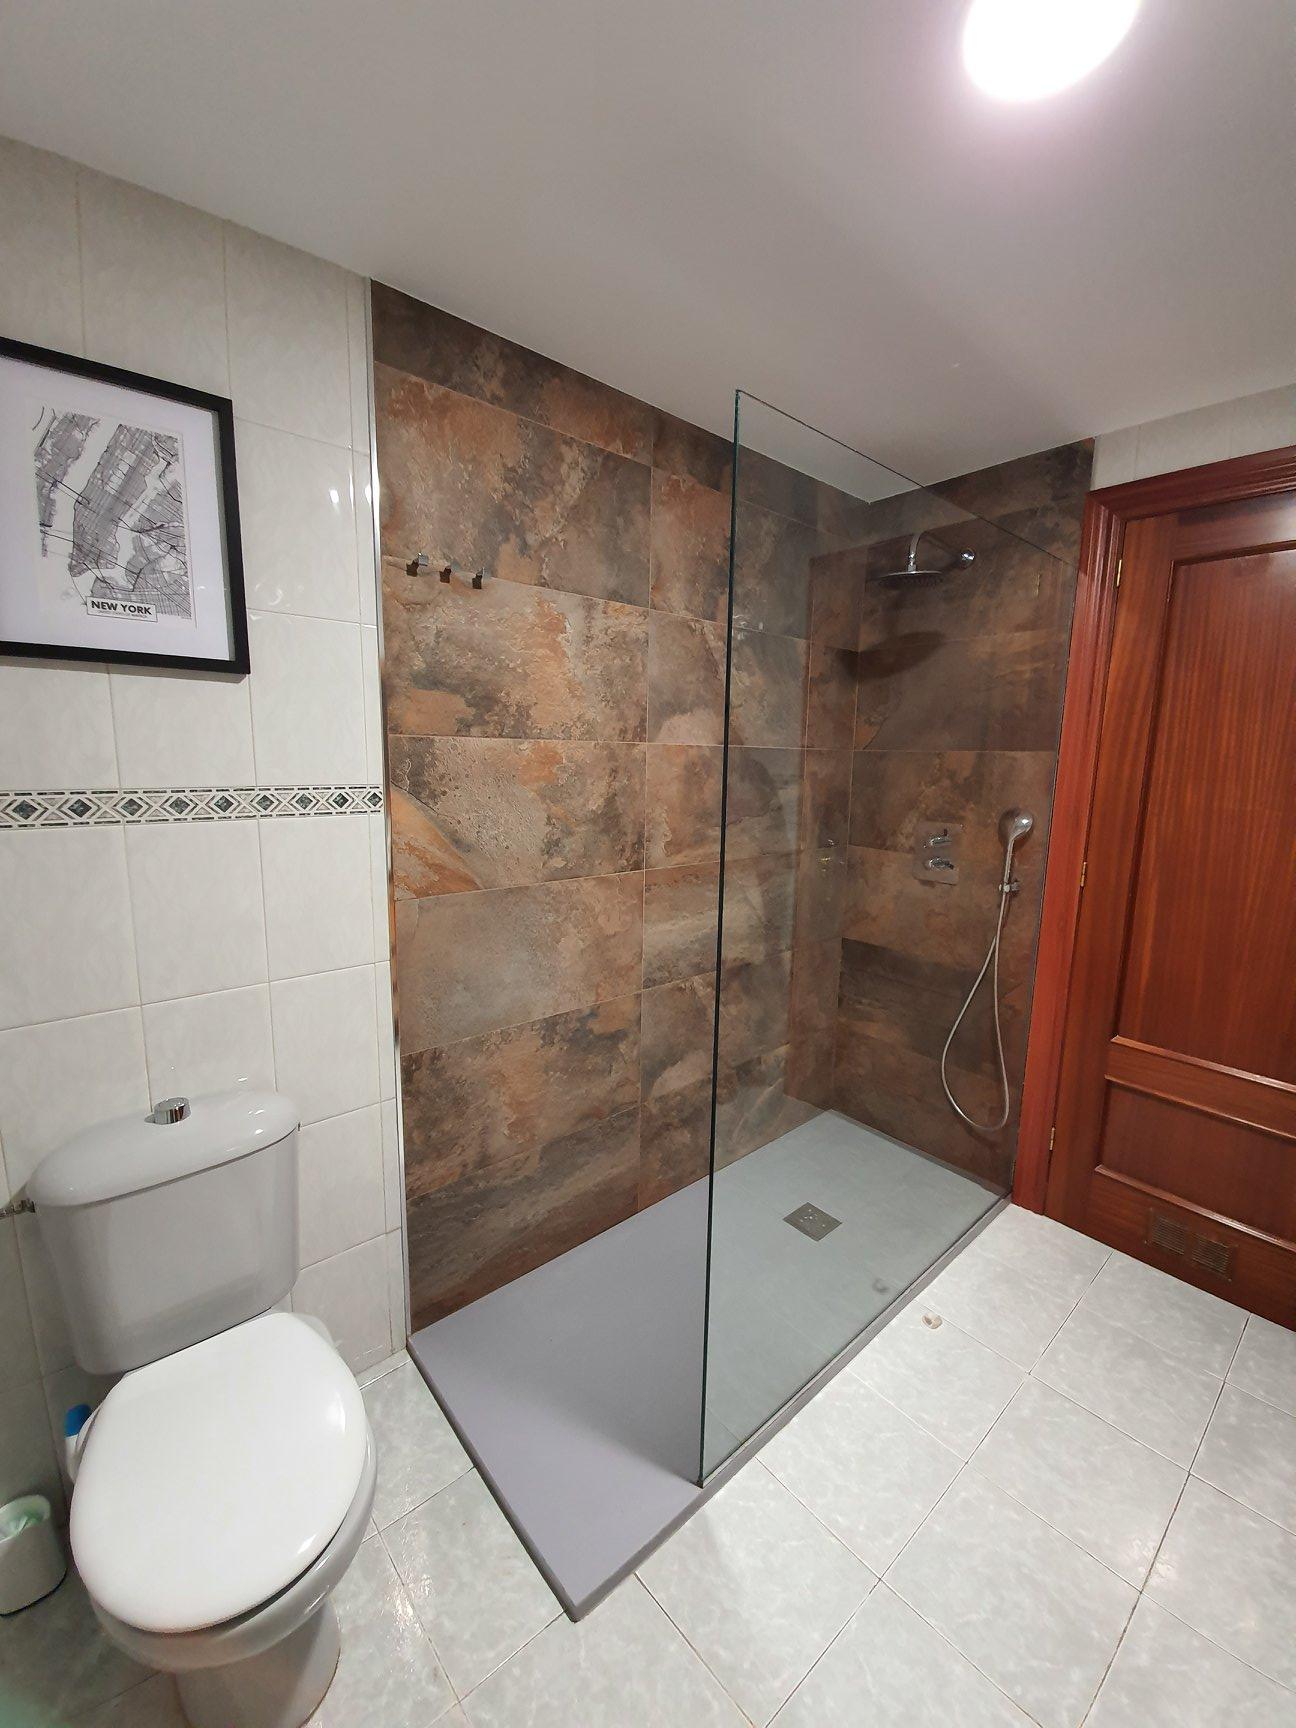 Proceso de Cambio de bañera por plato de ducha plano; columna termostática empotrada; mampara.